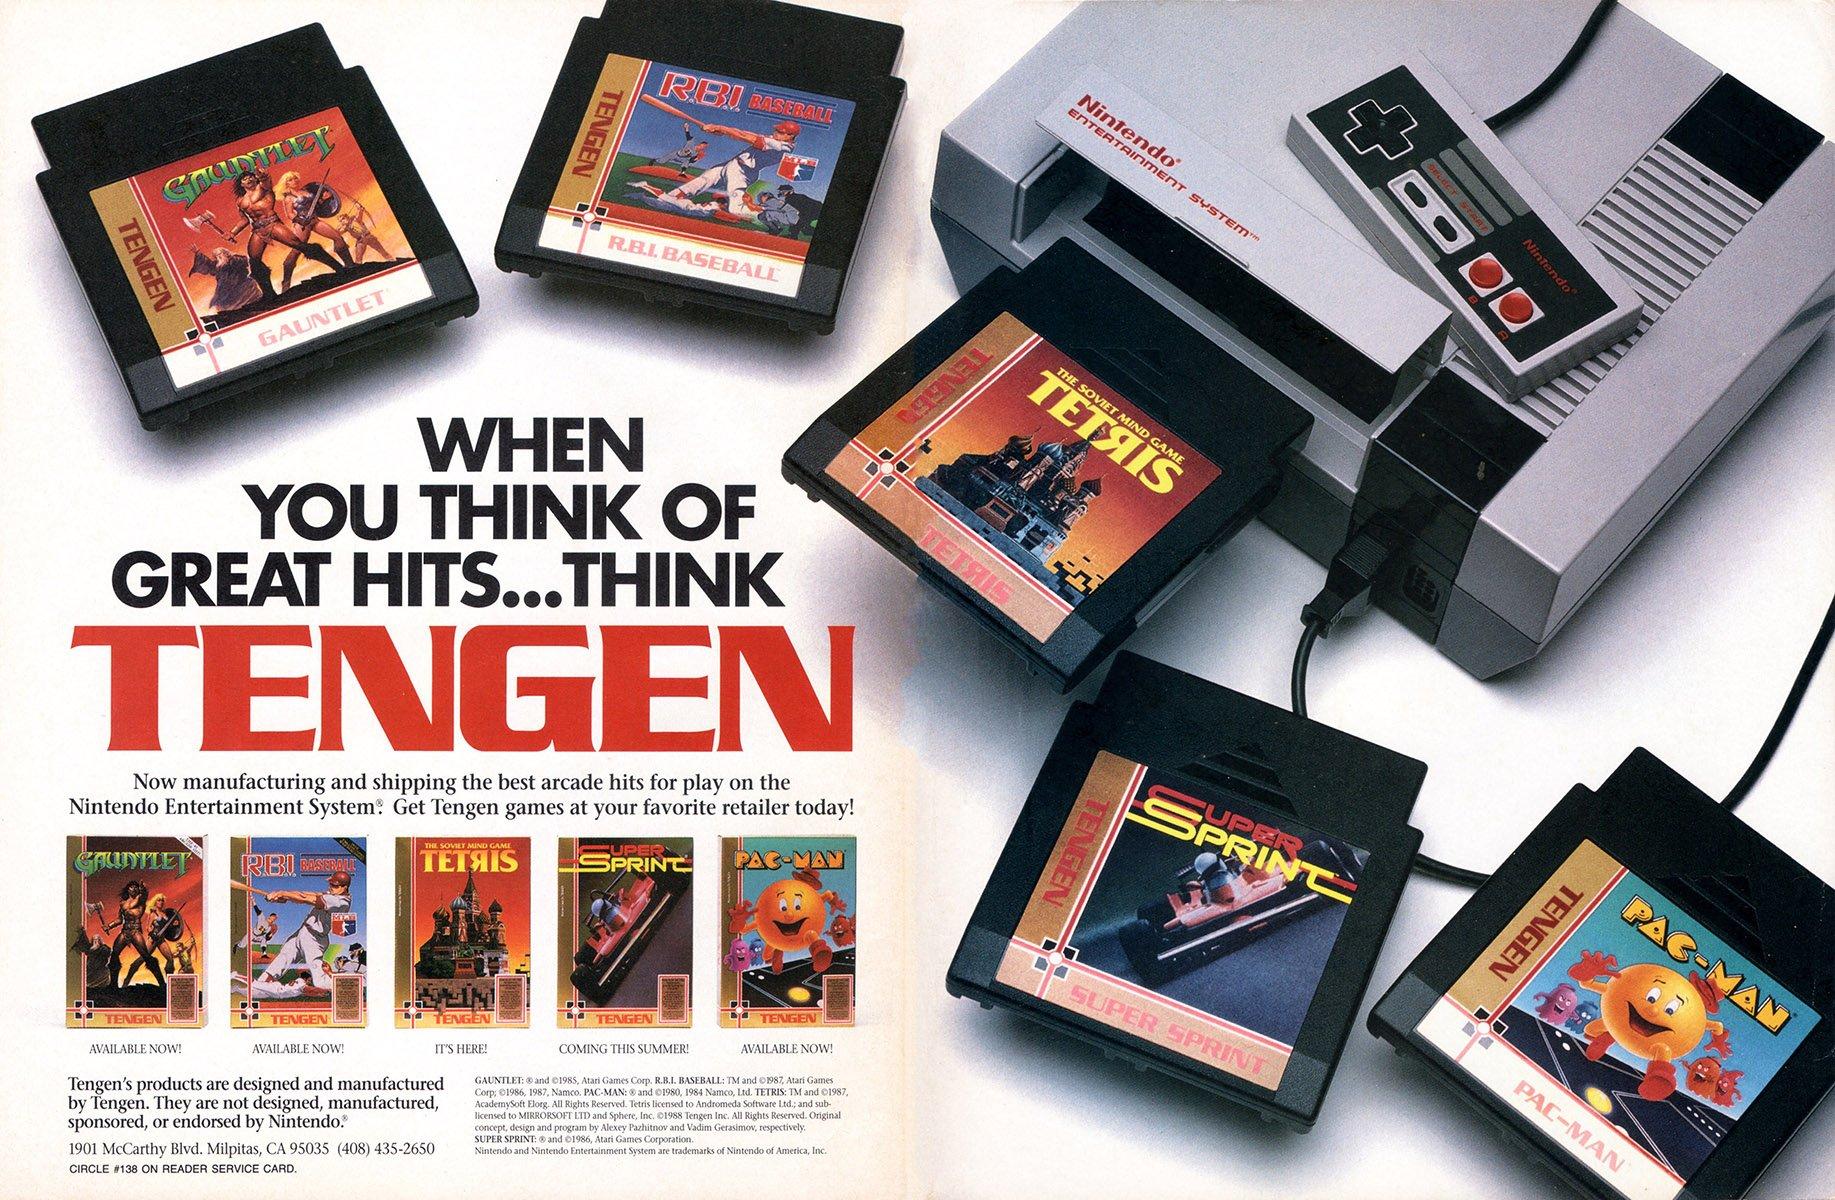 Tengen multi-ad (Gauntlet, RBI Baseball, Tetris, Super Sprint, Pac-Man)